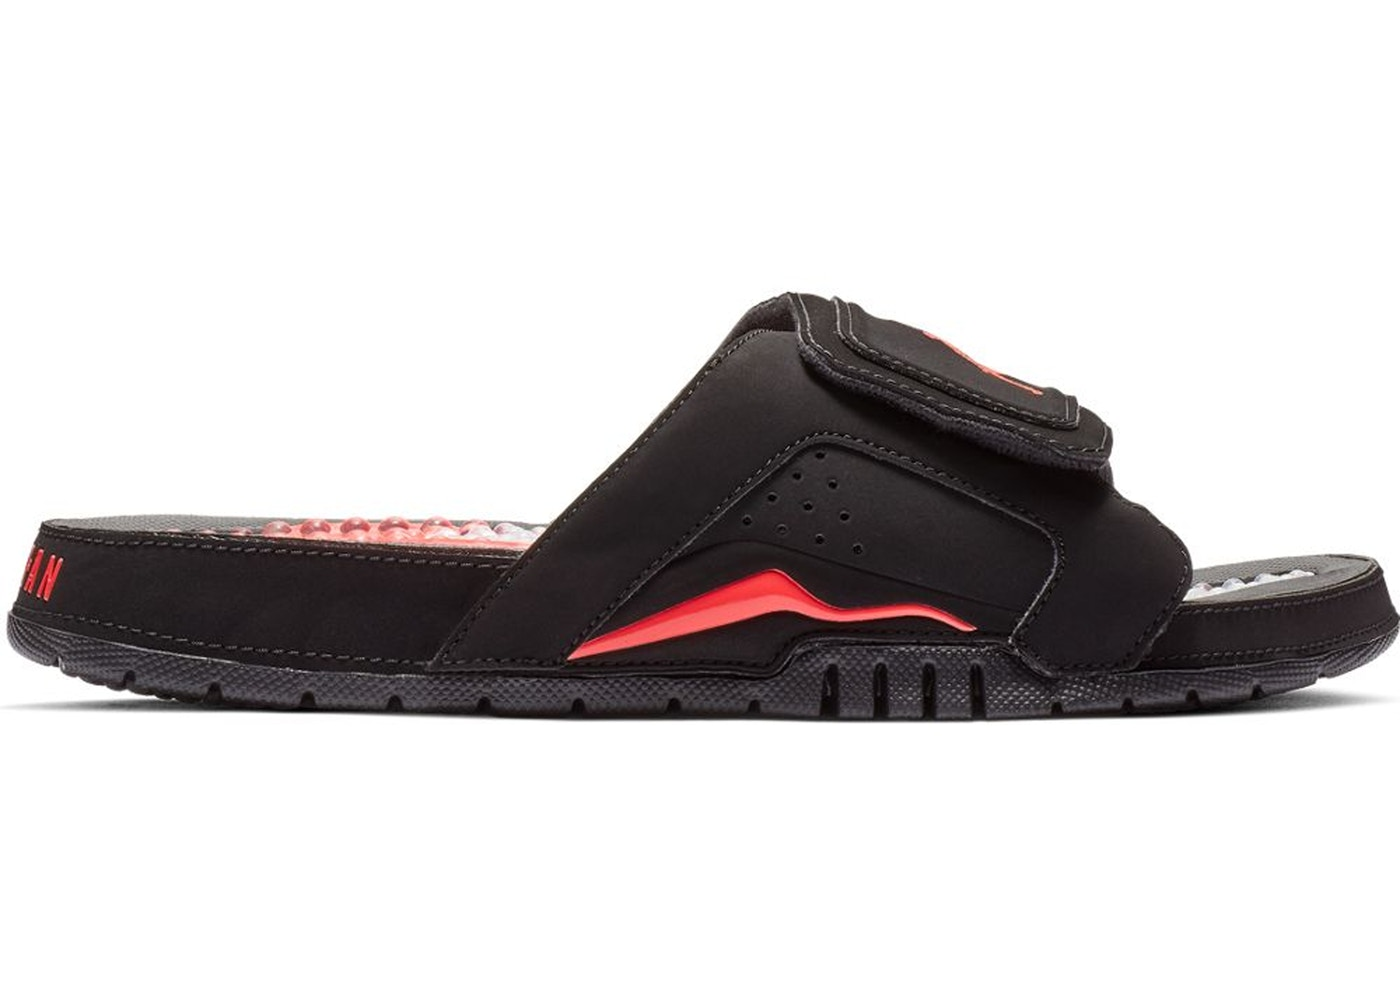 wholesale dealer f4162 47949 Jordan Hydro 6 Retro Black Infrared 23 - 630752-060